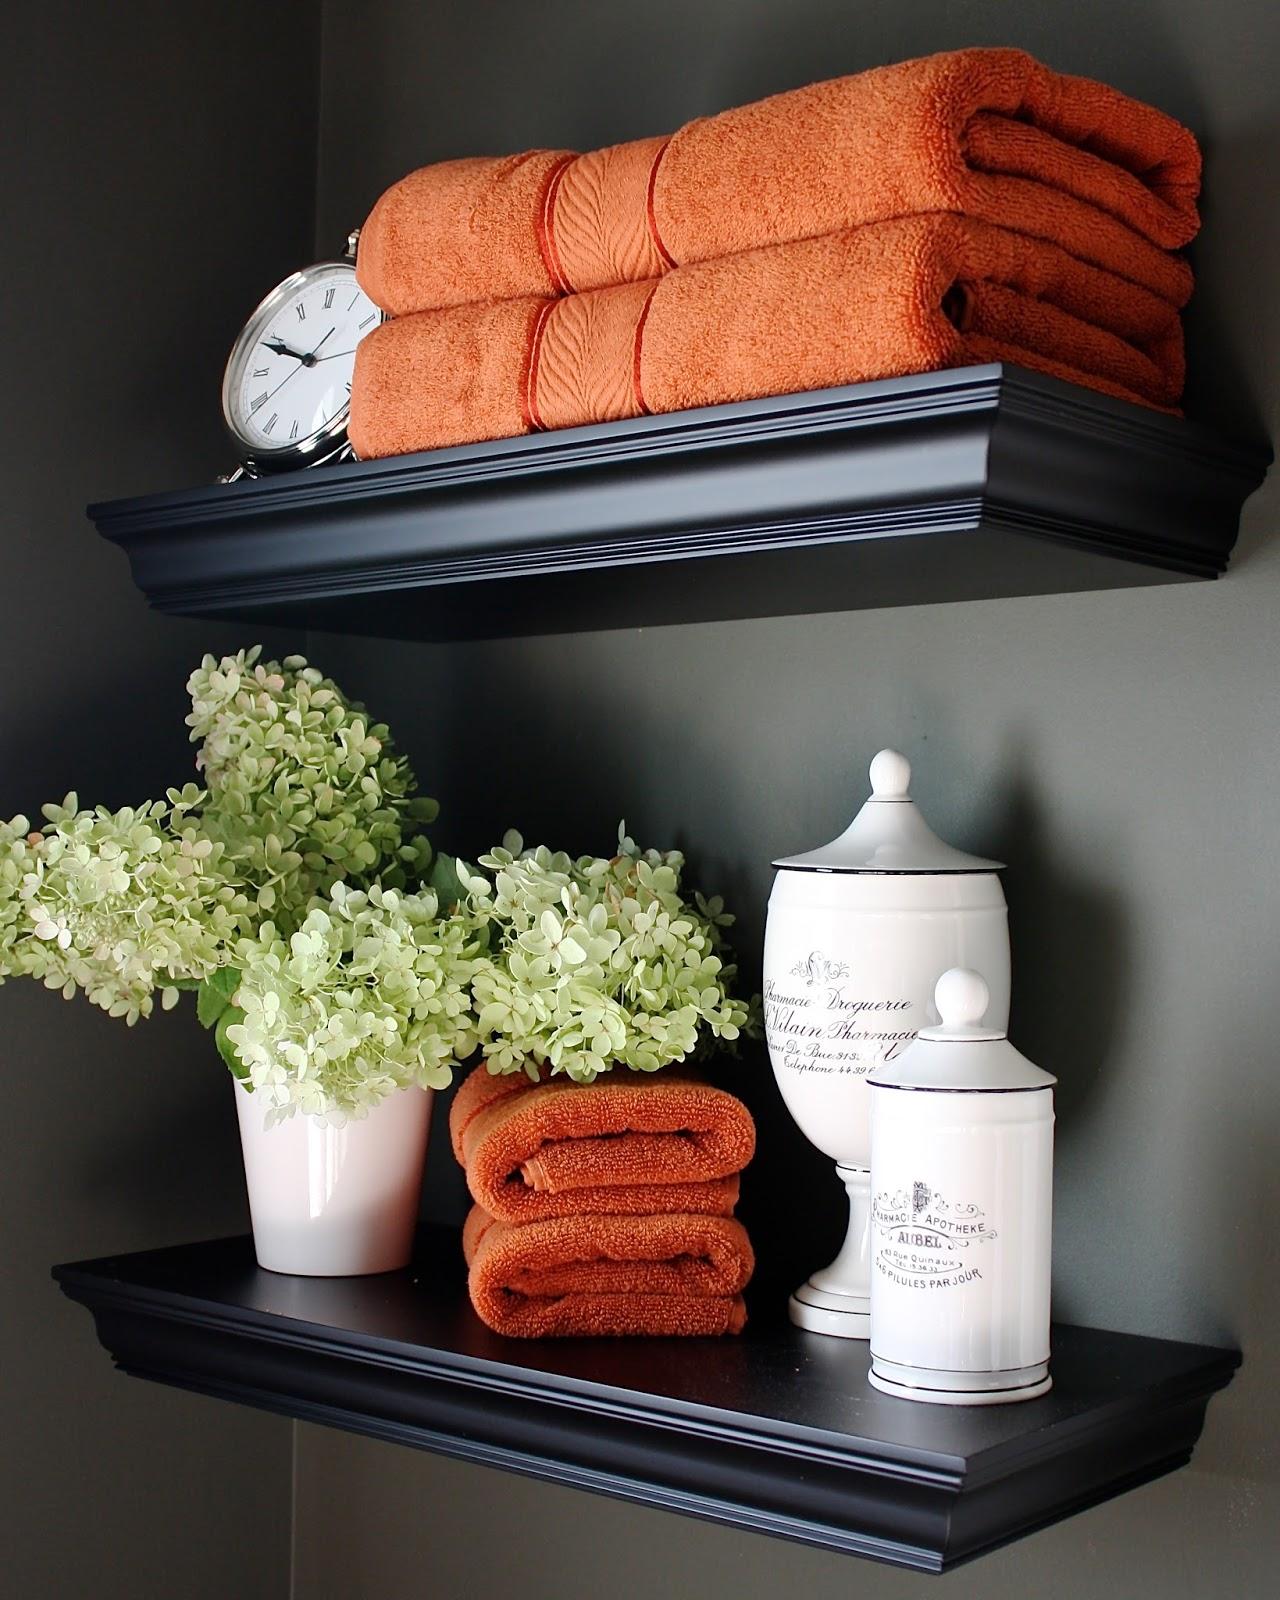 Bathroom Shelf above Toilet Decor Ideas